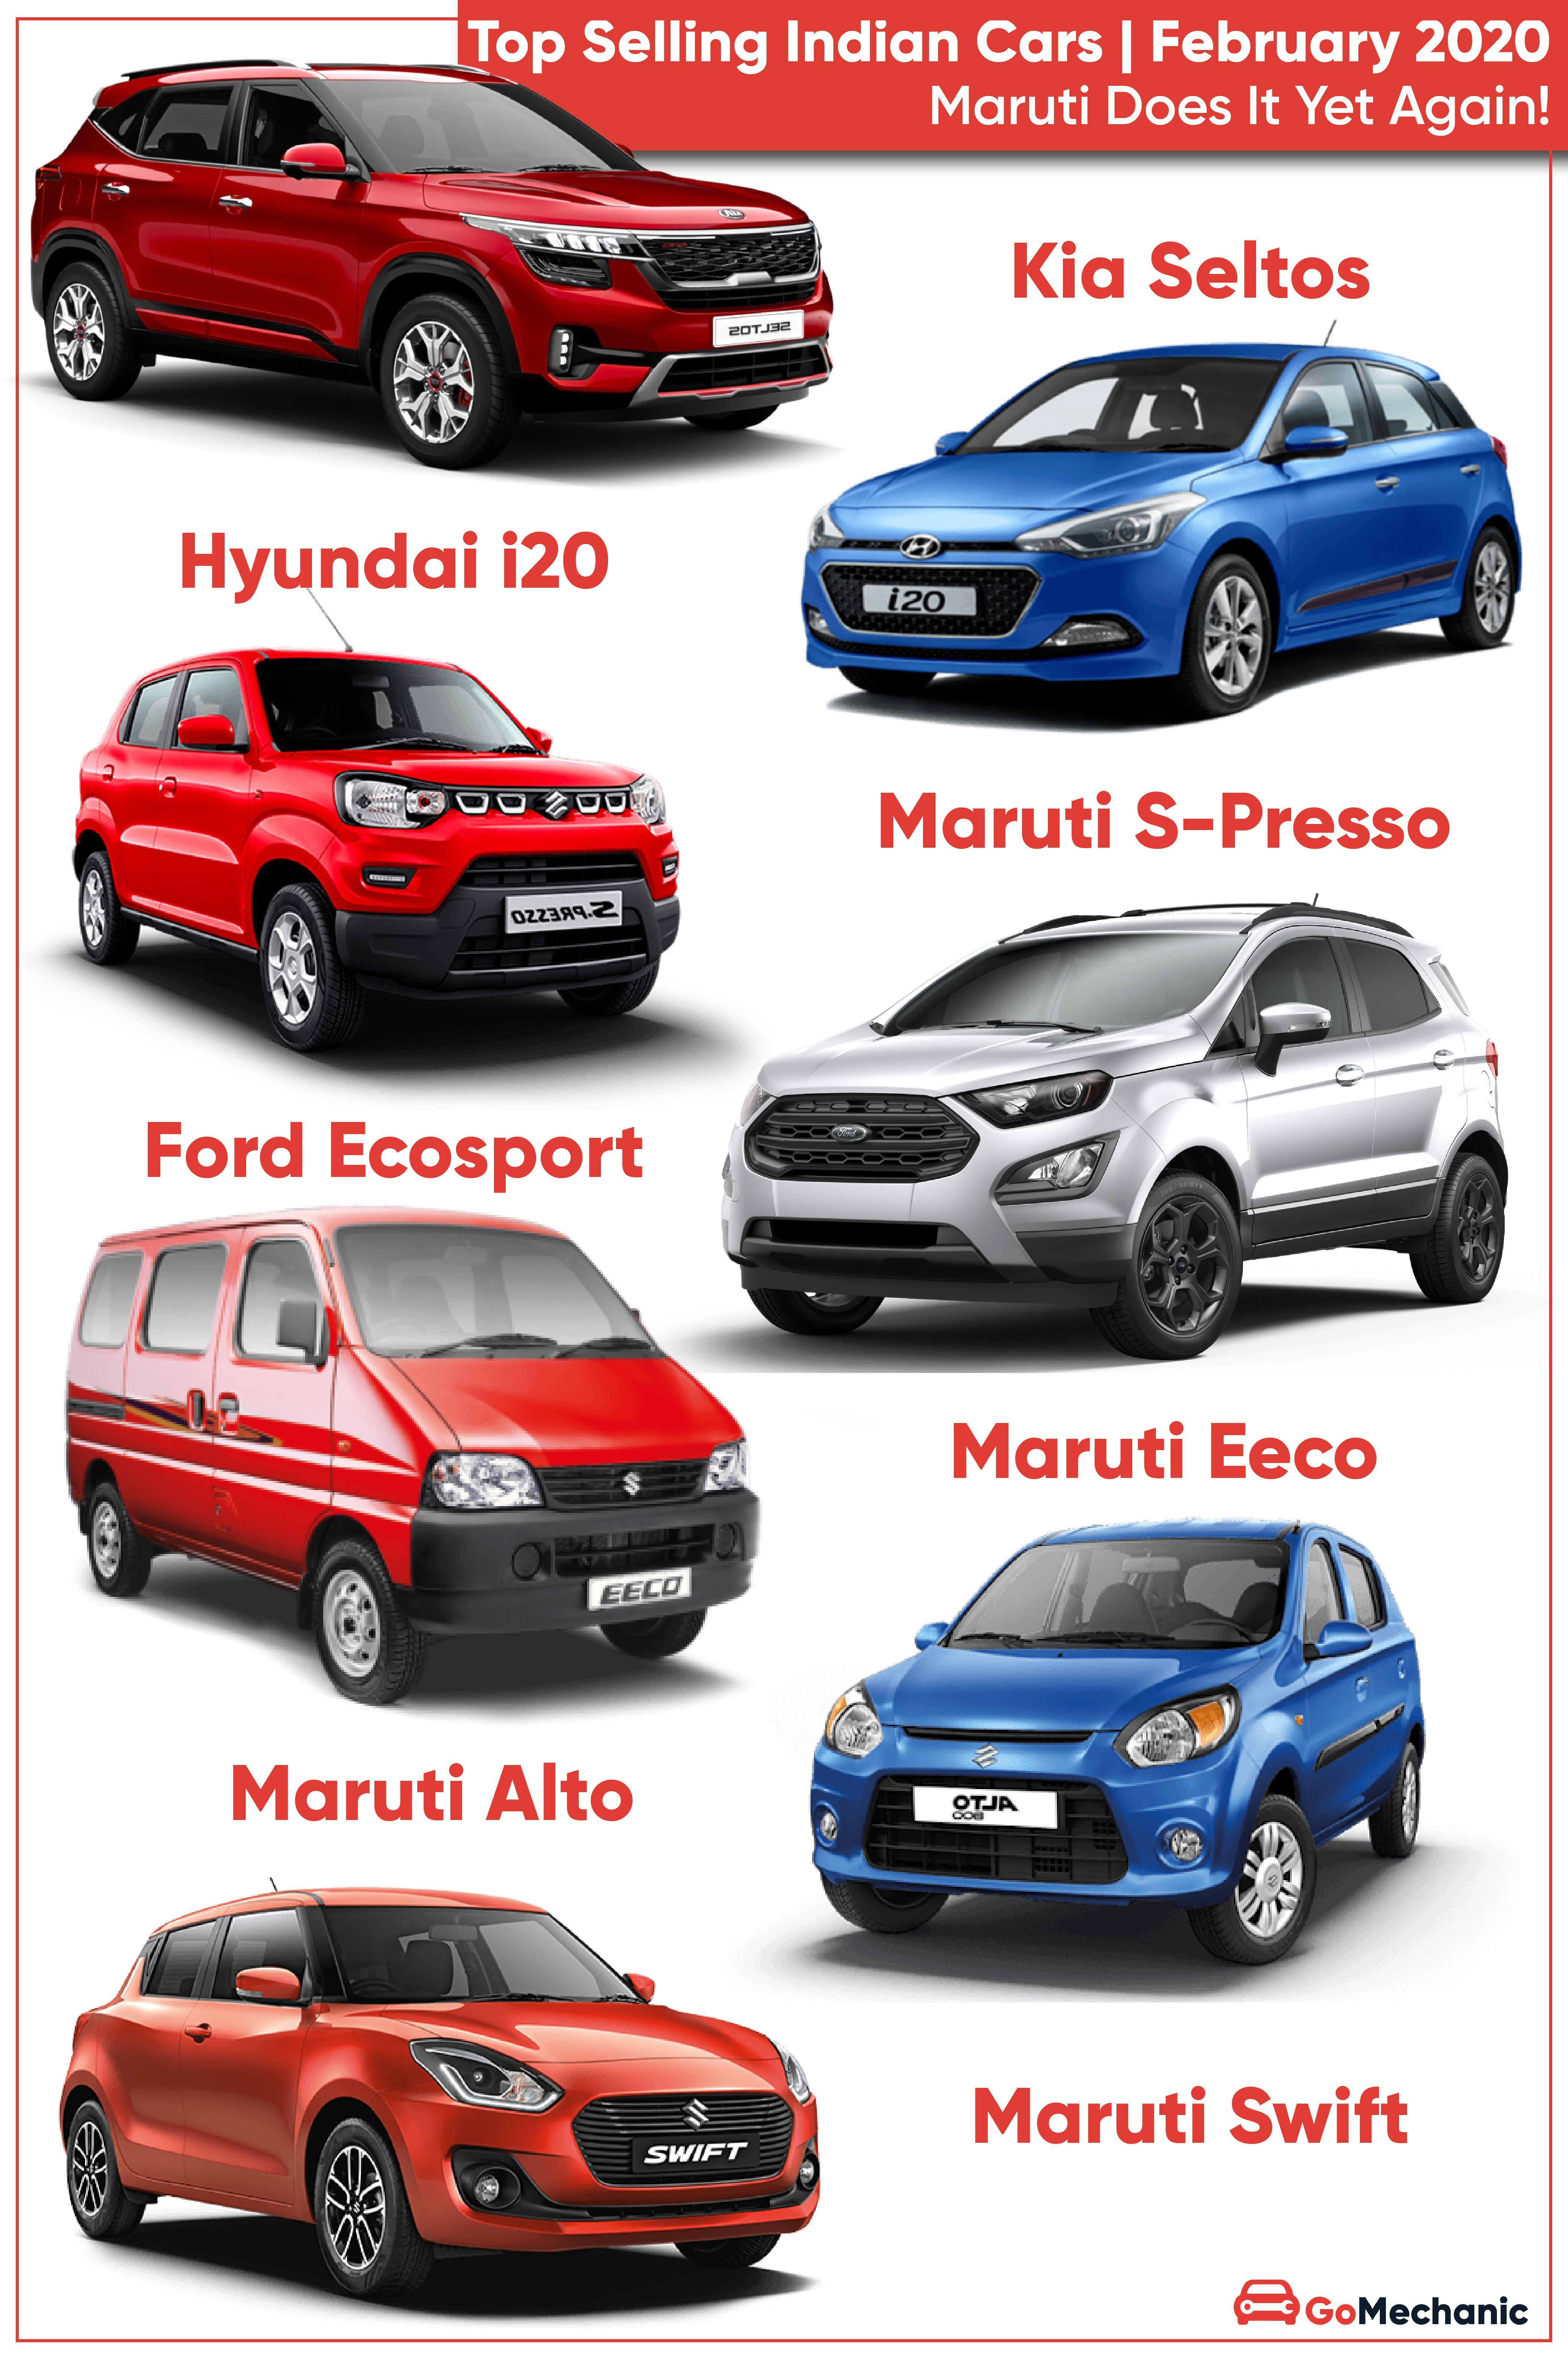 Top Selling Cars In February 2020 Maruti Leads Hyundai Kia Follow In 2020 Kia Cars Car Budget